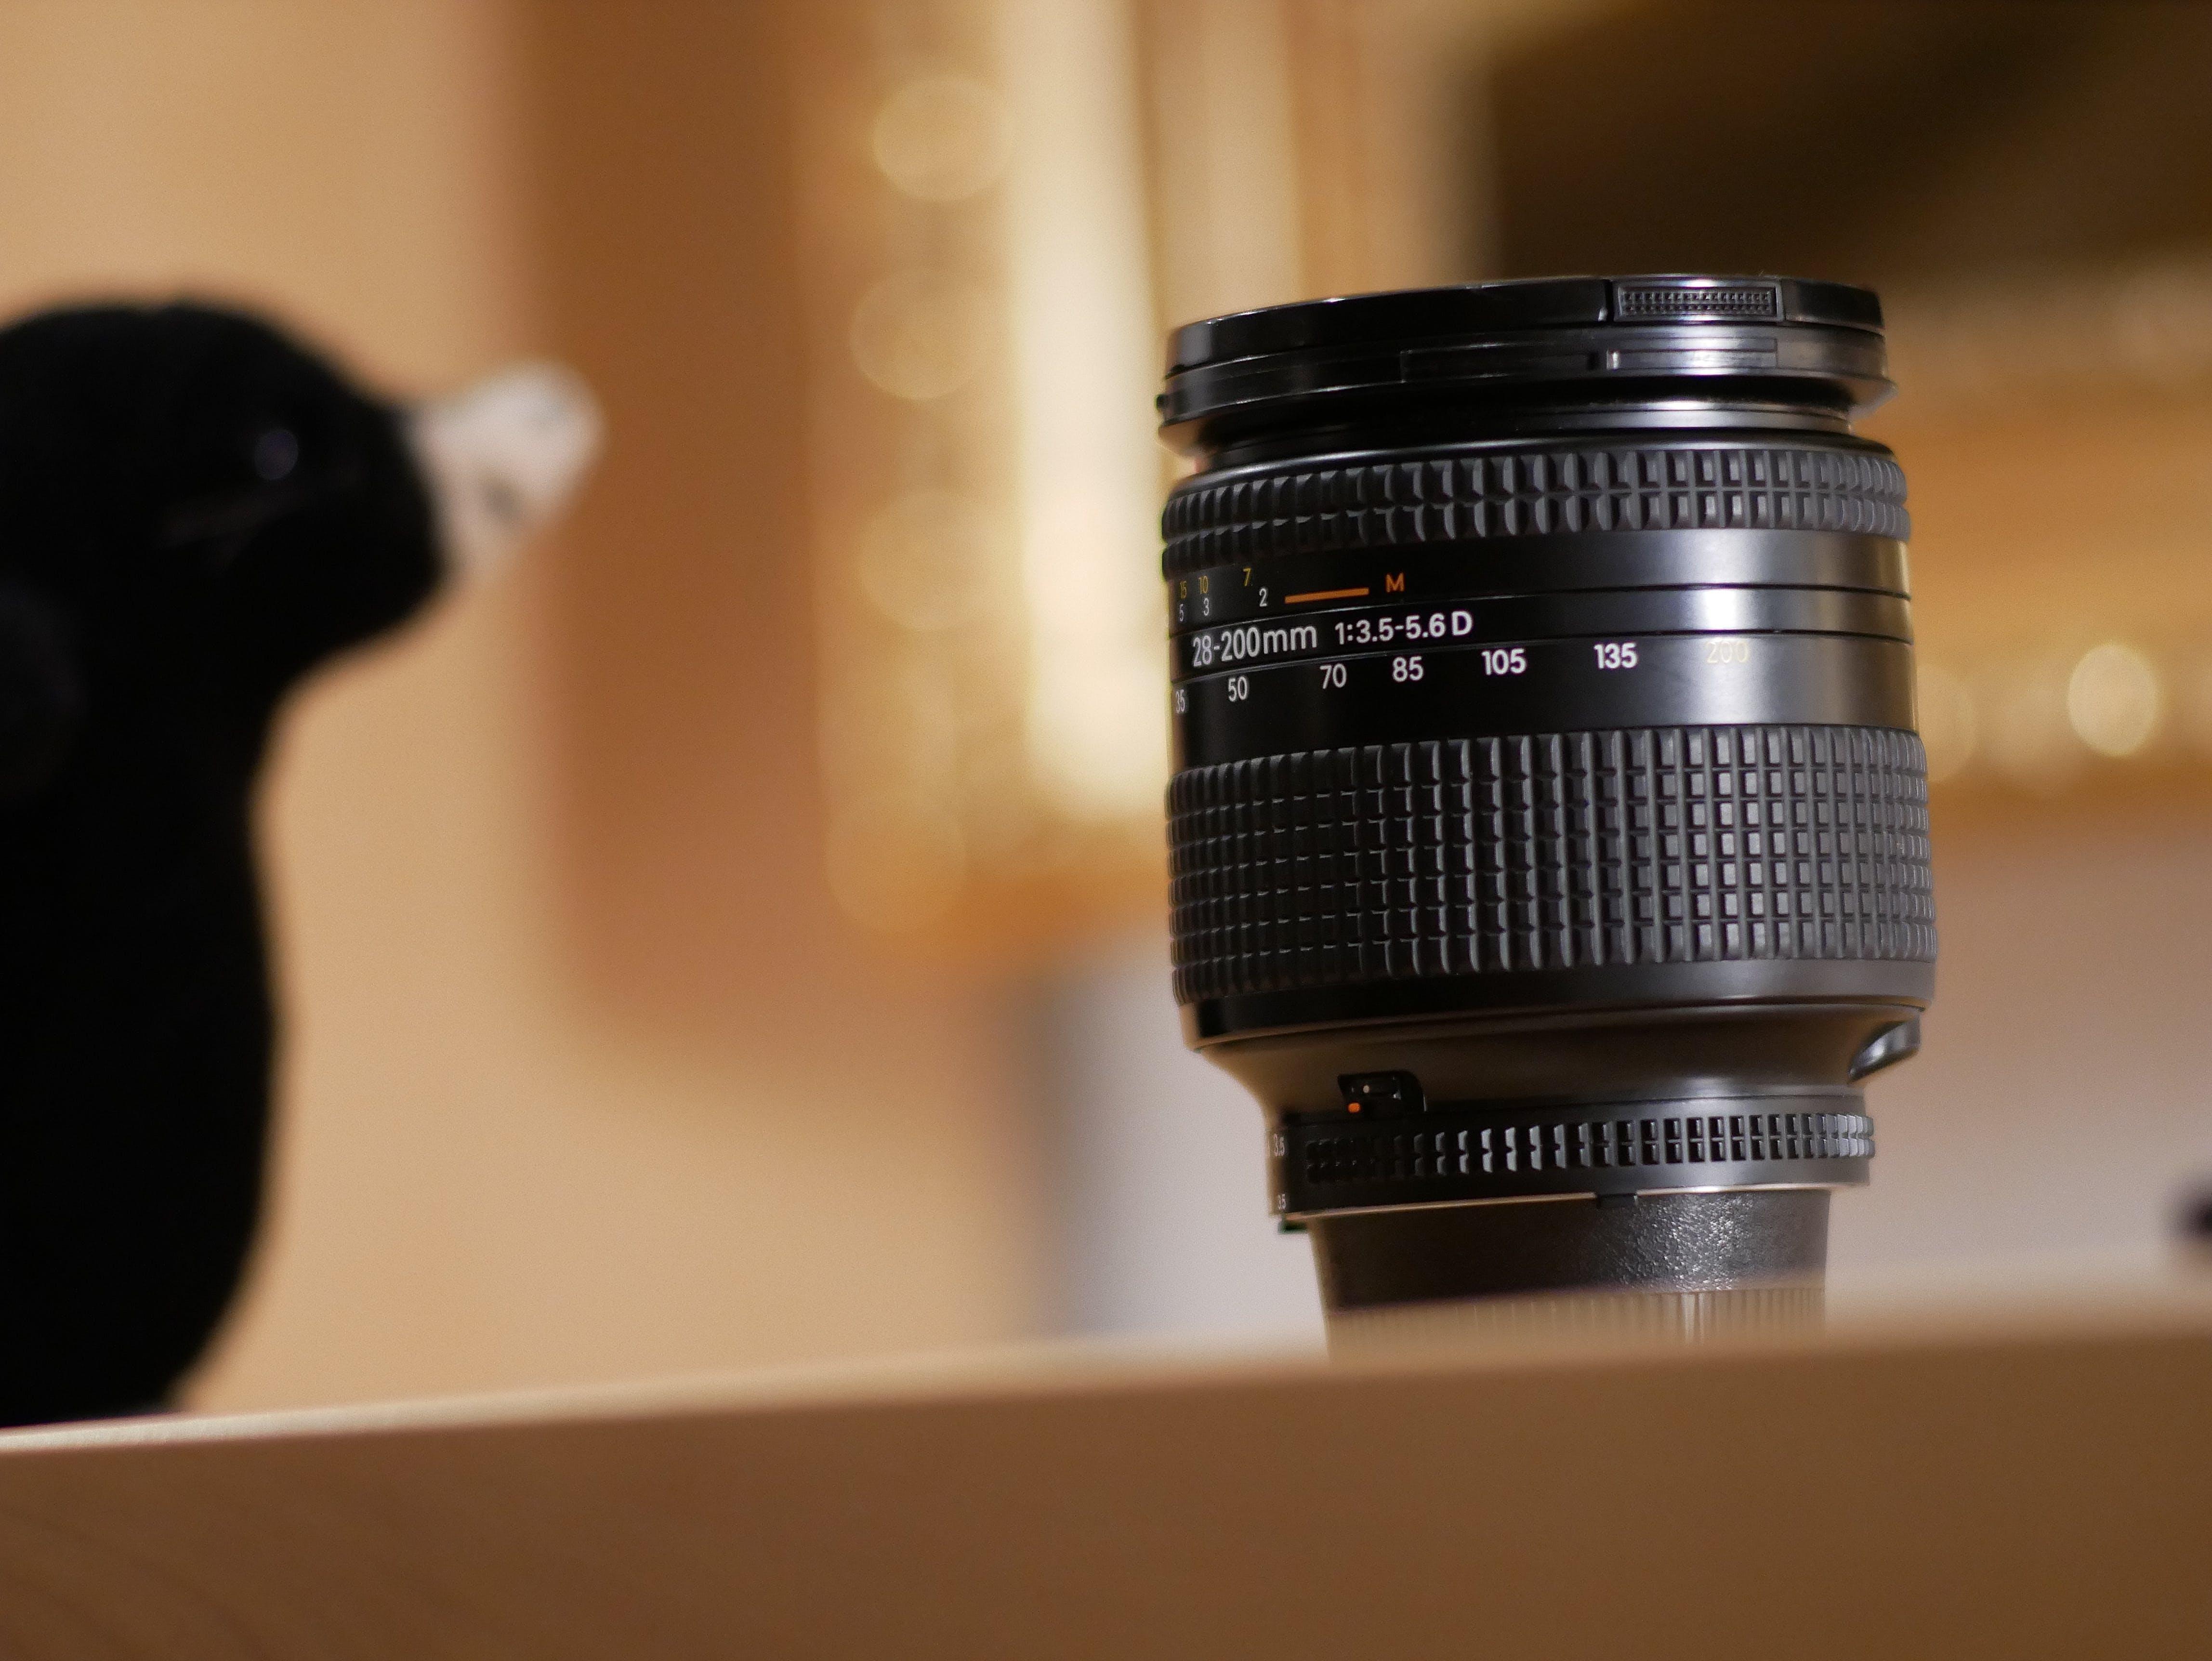 Black Camera Lens on Brown Surface